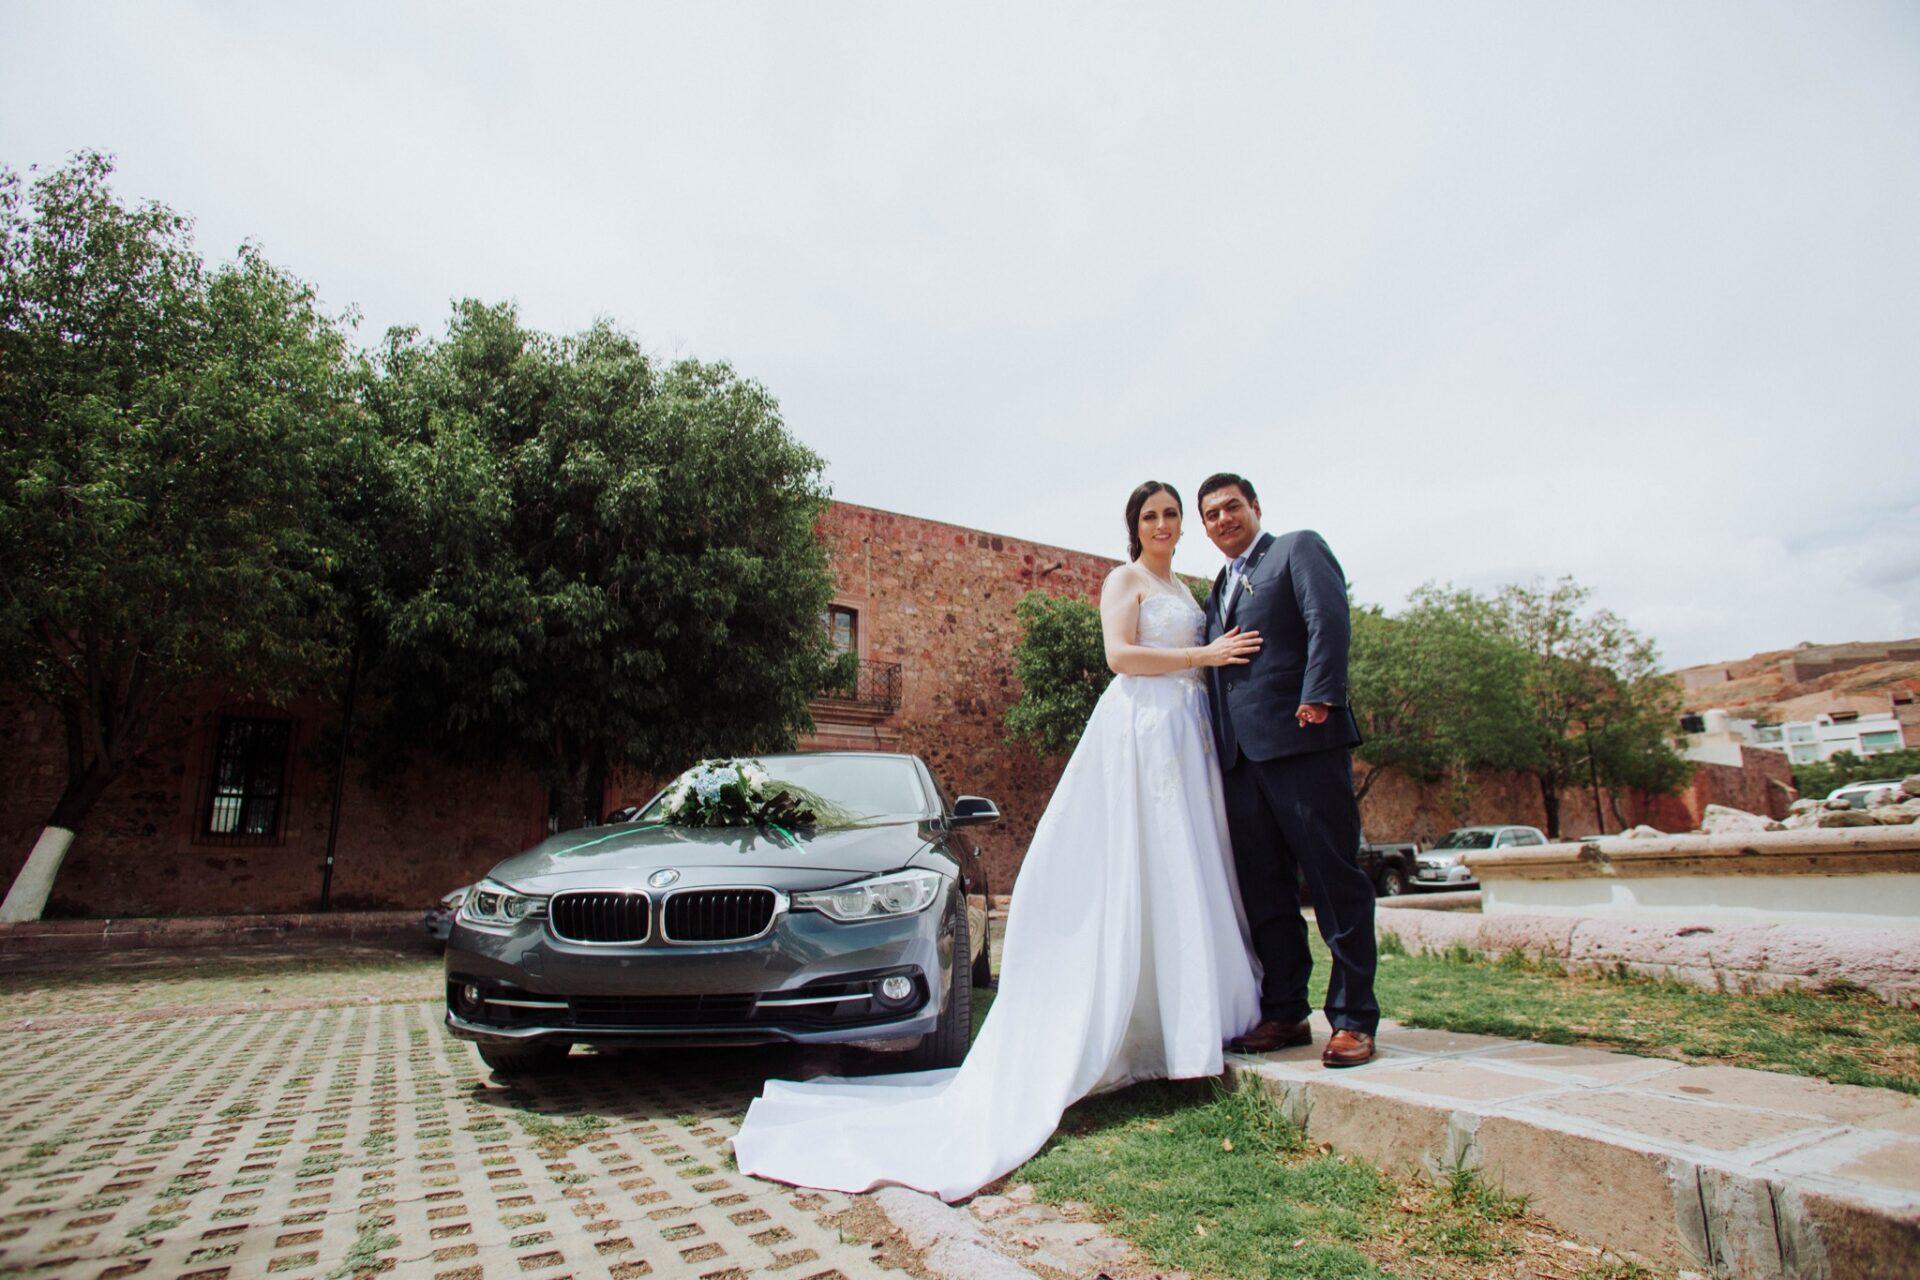 javier_noriega_fotografo_bodas_centro_platero_zacatecas_wedding_photographer26